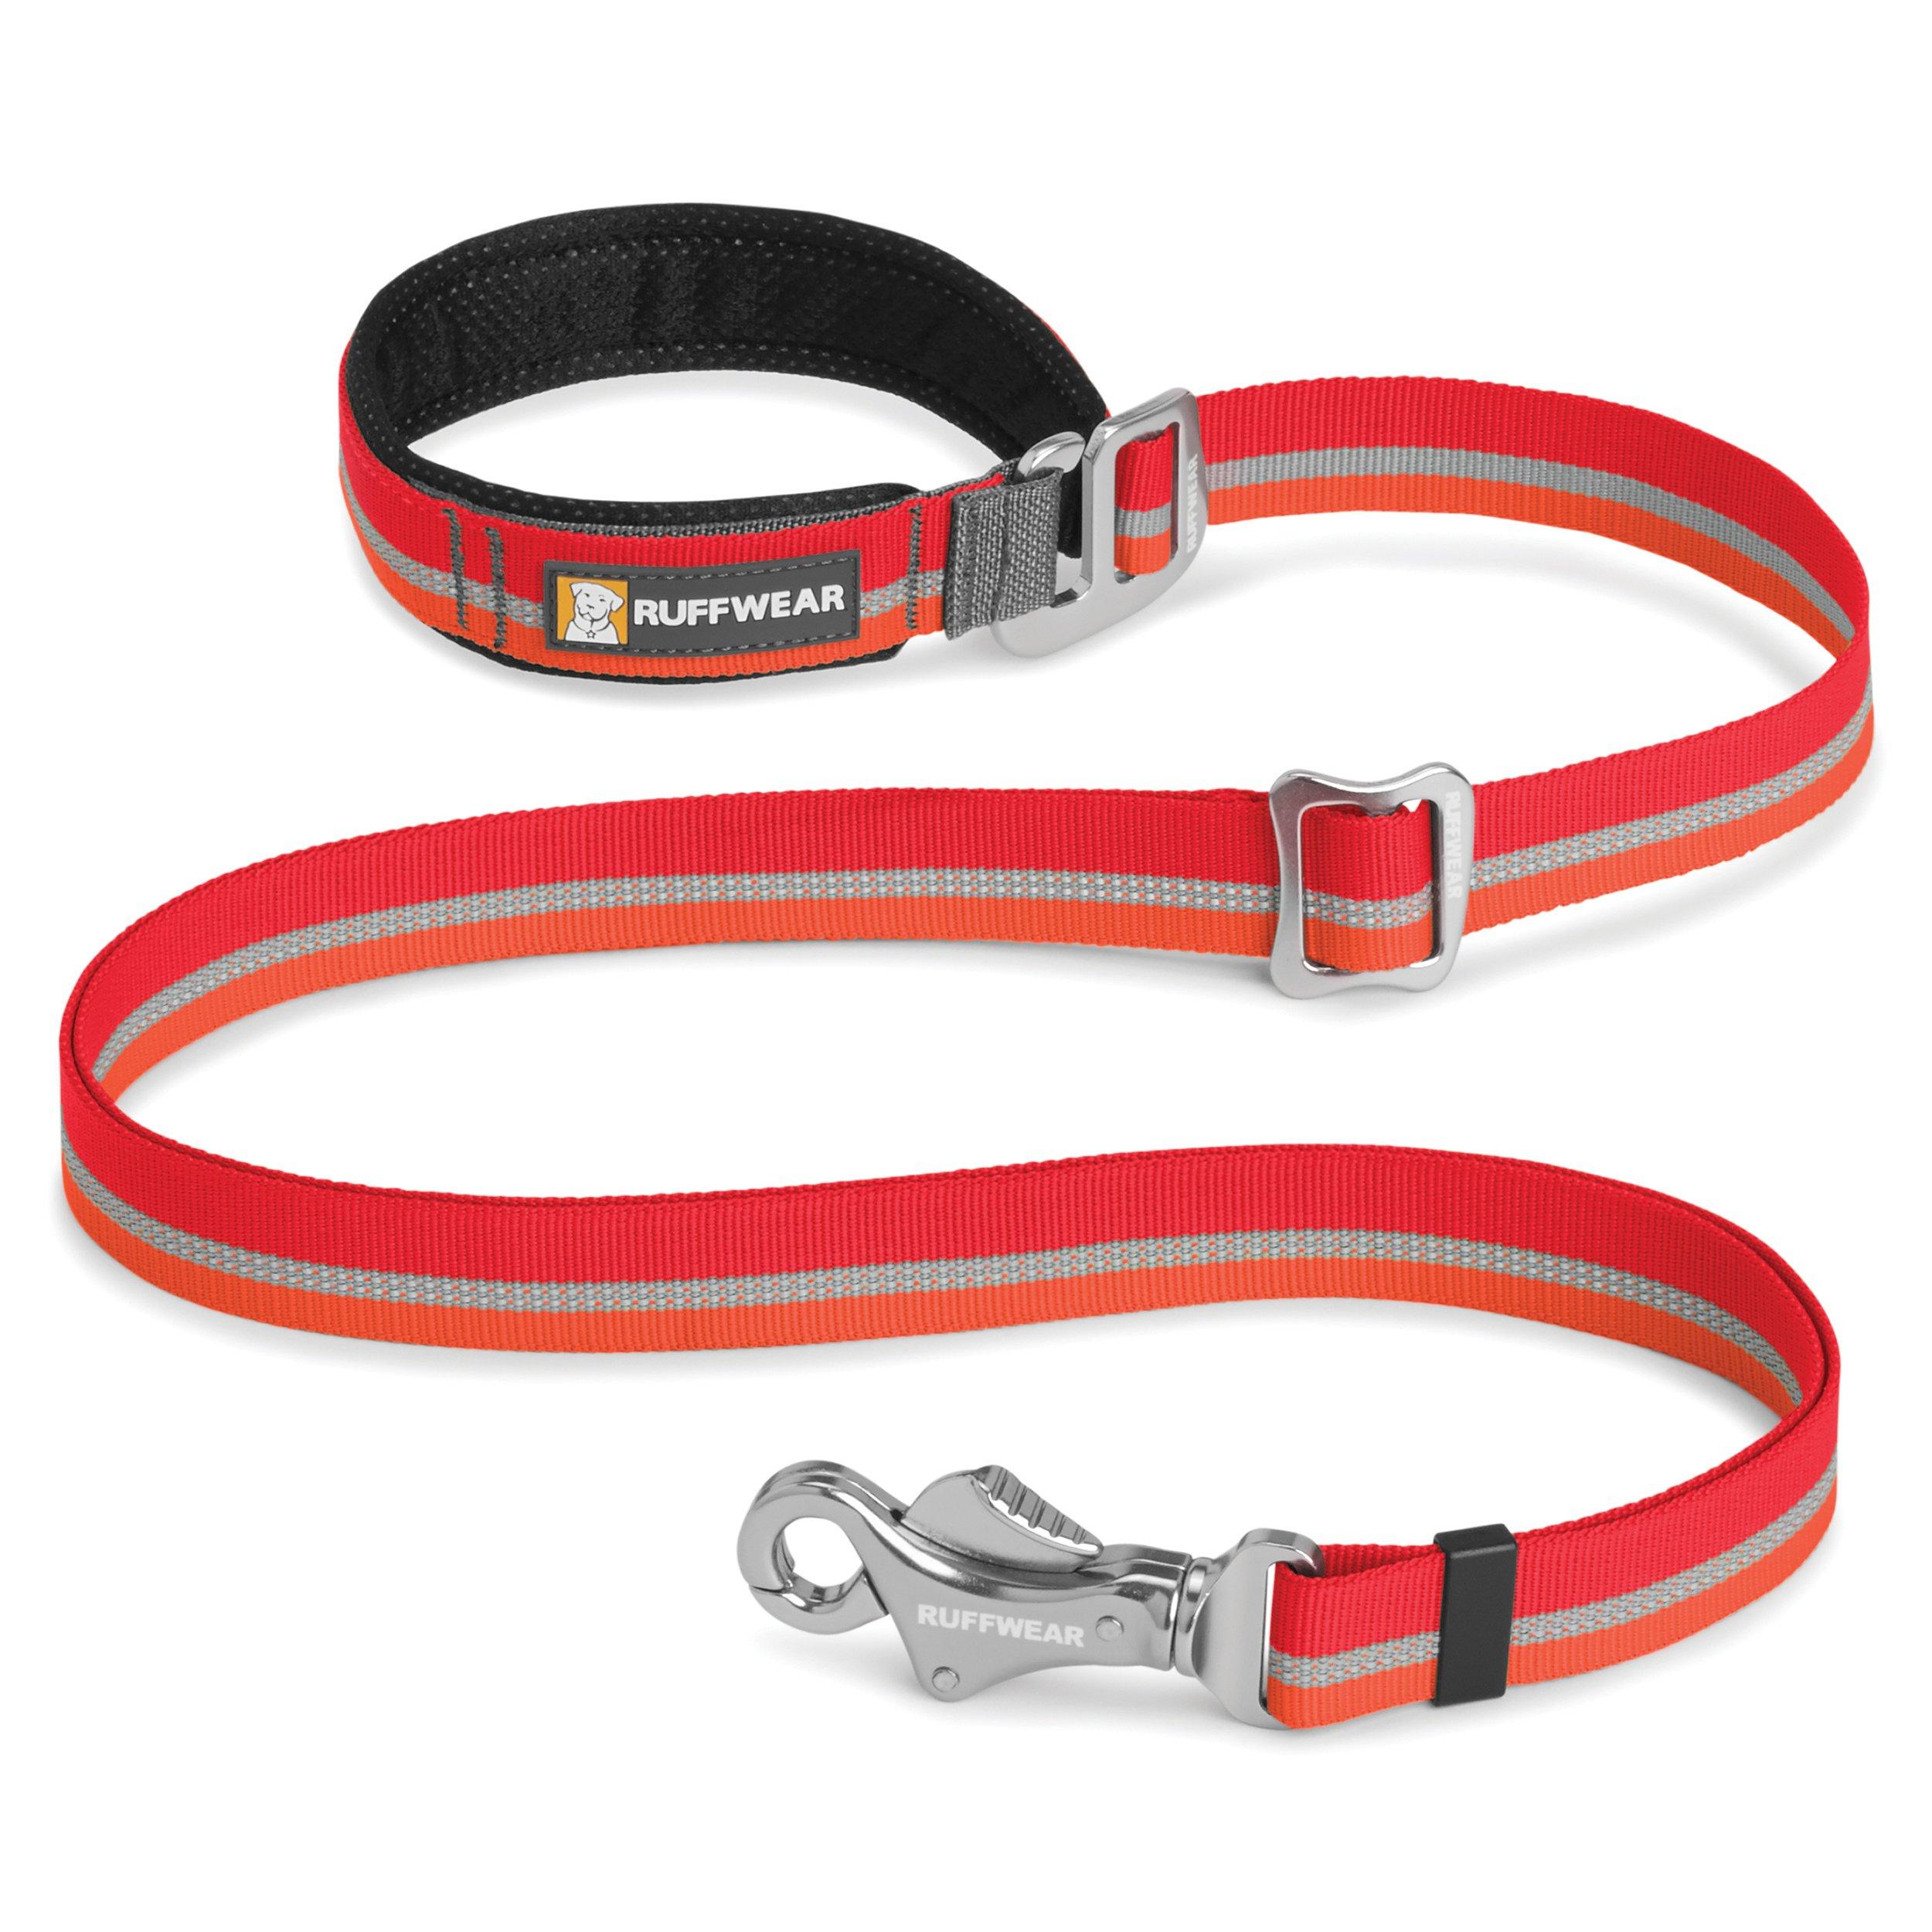 RUFFWEAR - Slackline Adjustable Length, Hand-Held or Waist-Worn Dog Leash, Kokanee Red